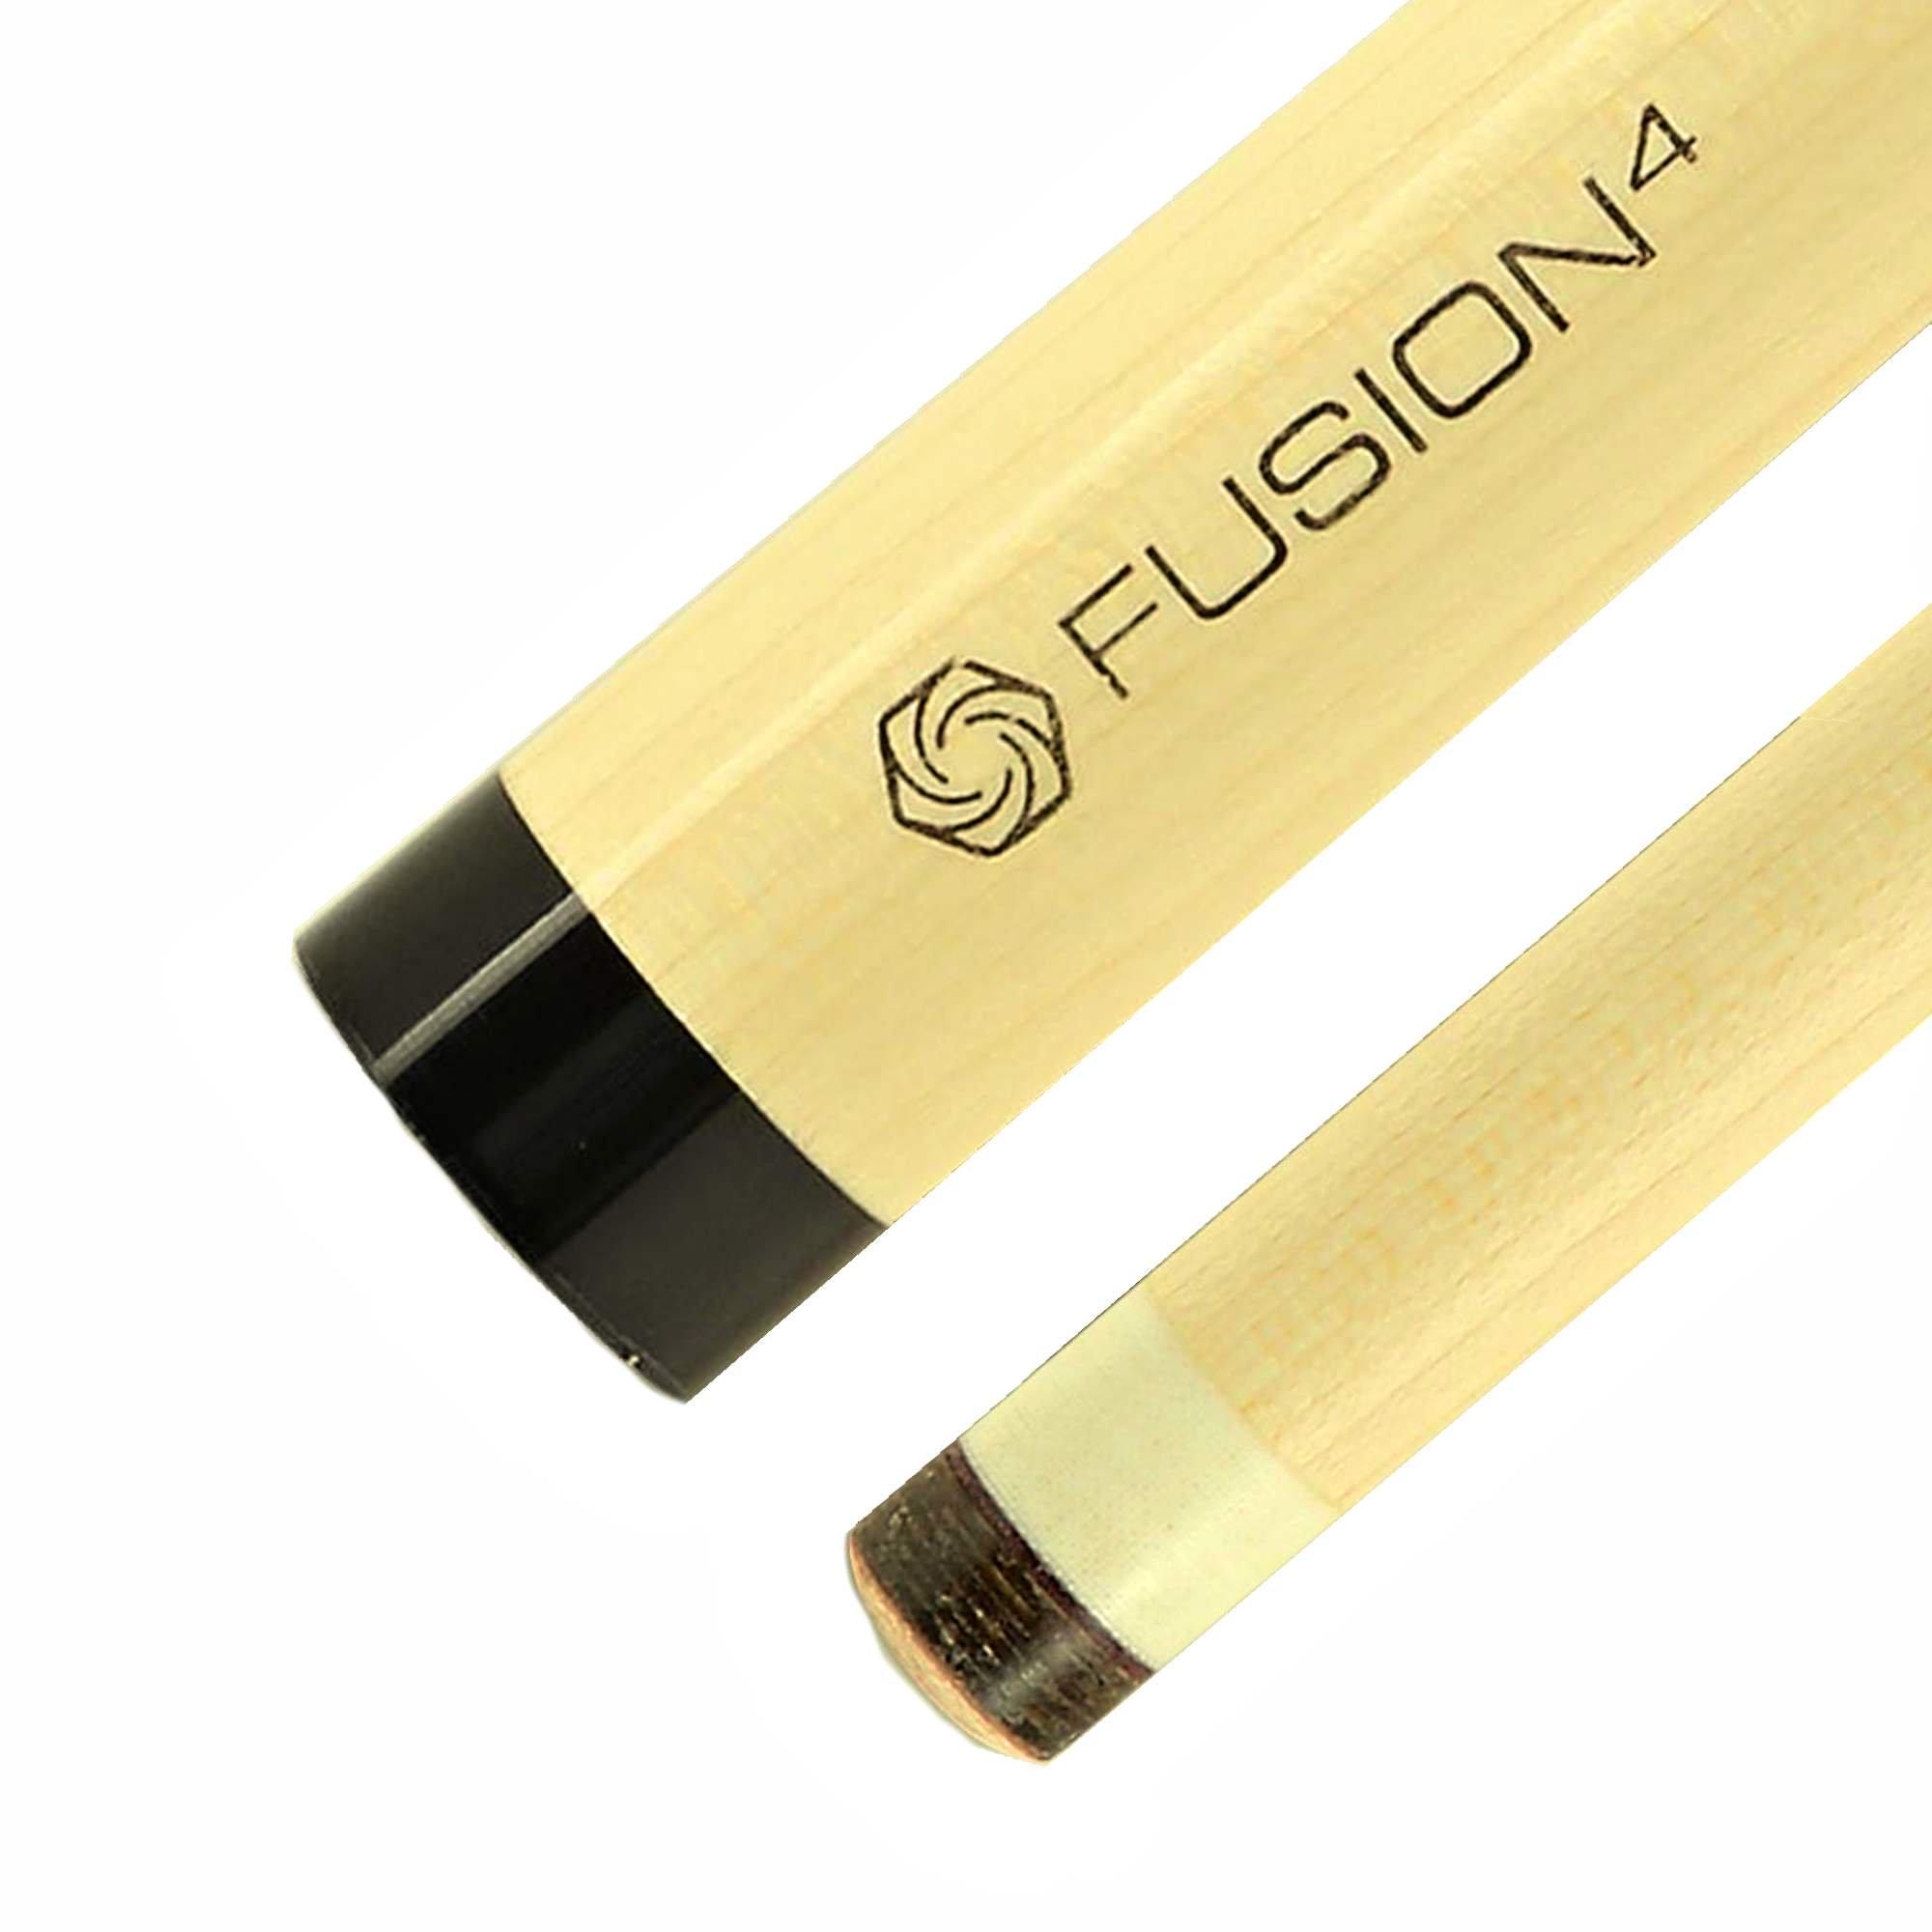 OB Fusion 12.8mm